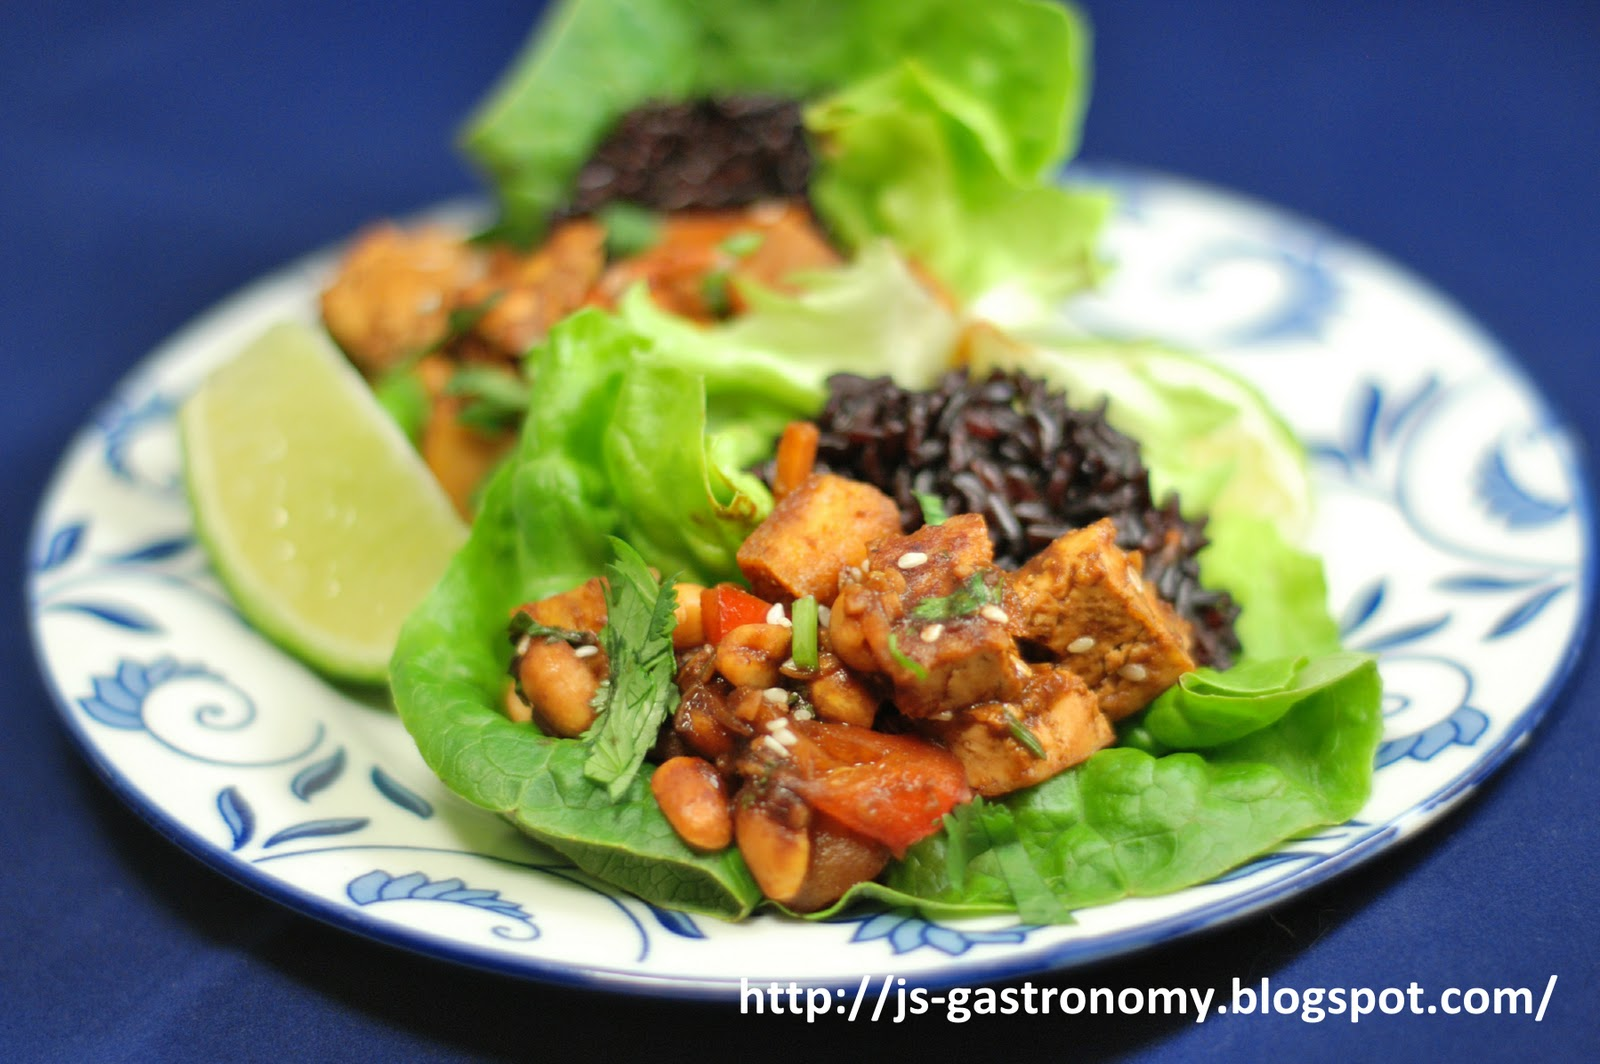 Gastronomy: Spicy Thai Tofu Lettuce Wraps